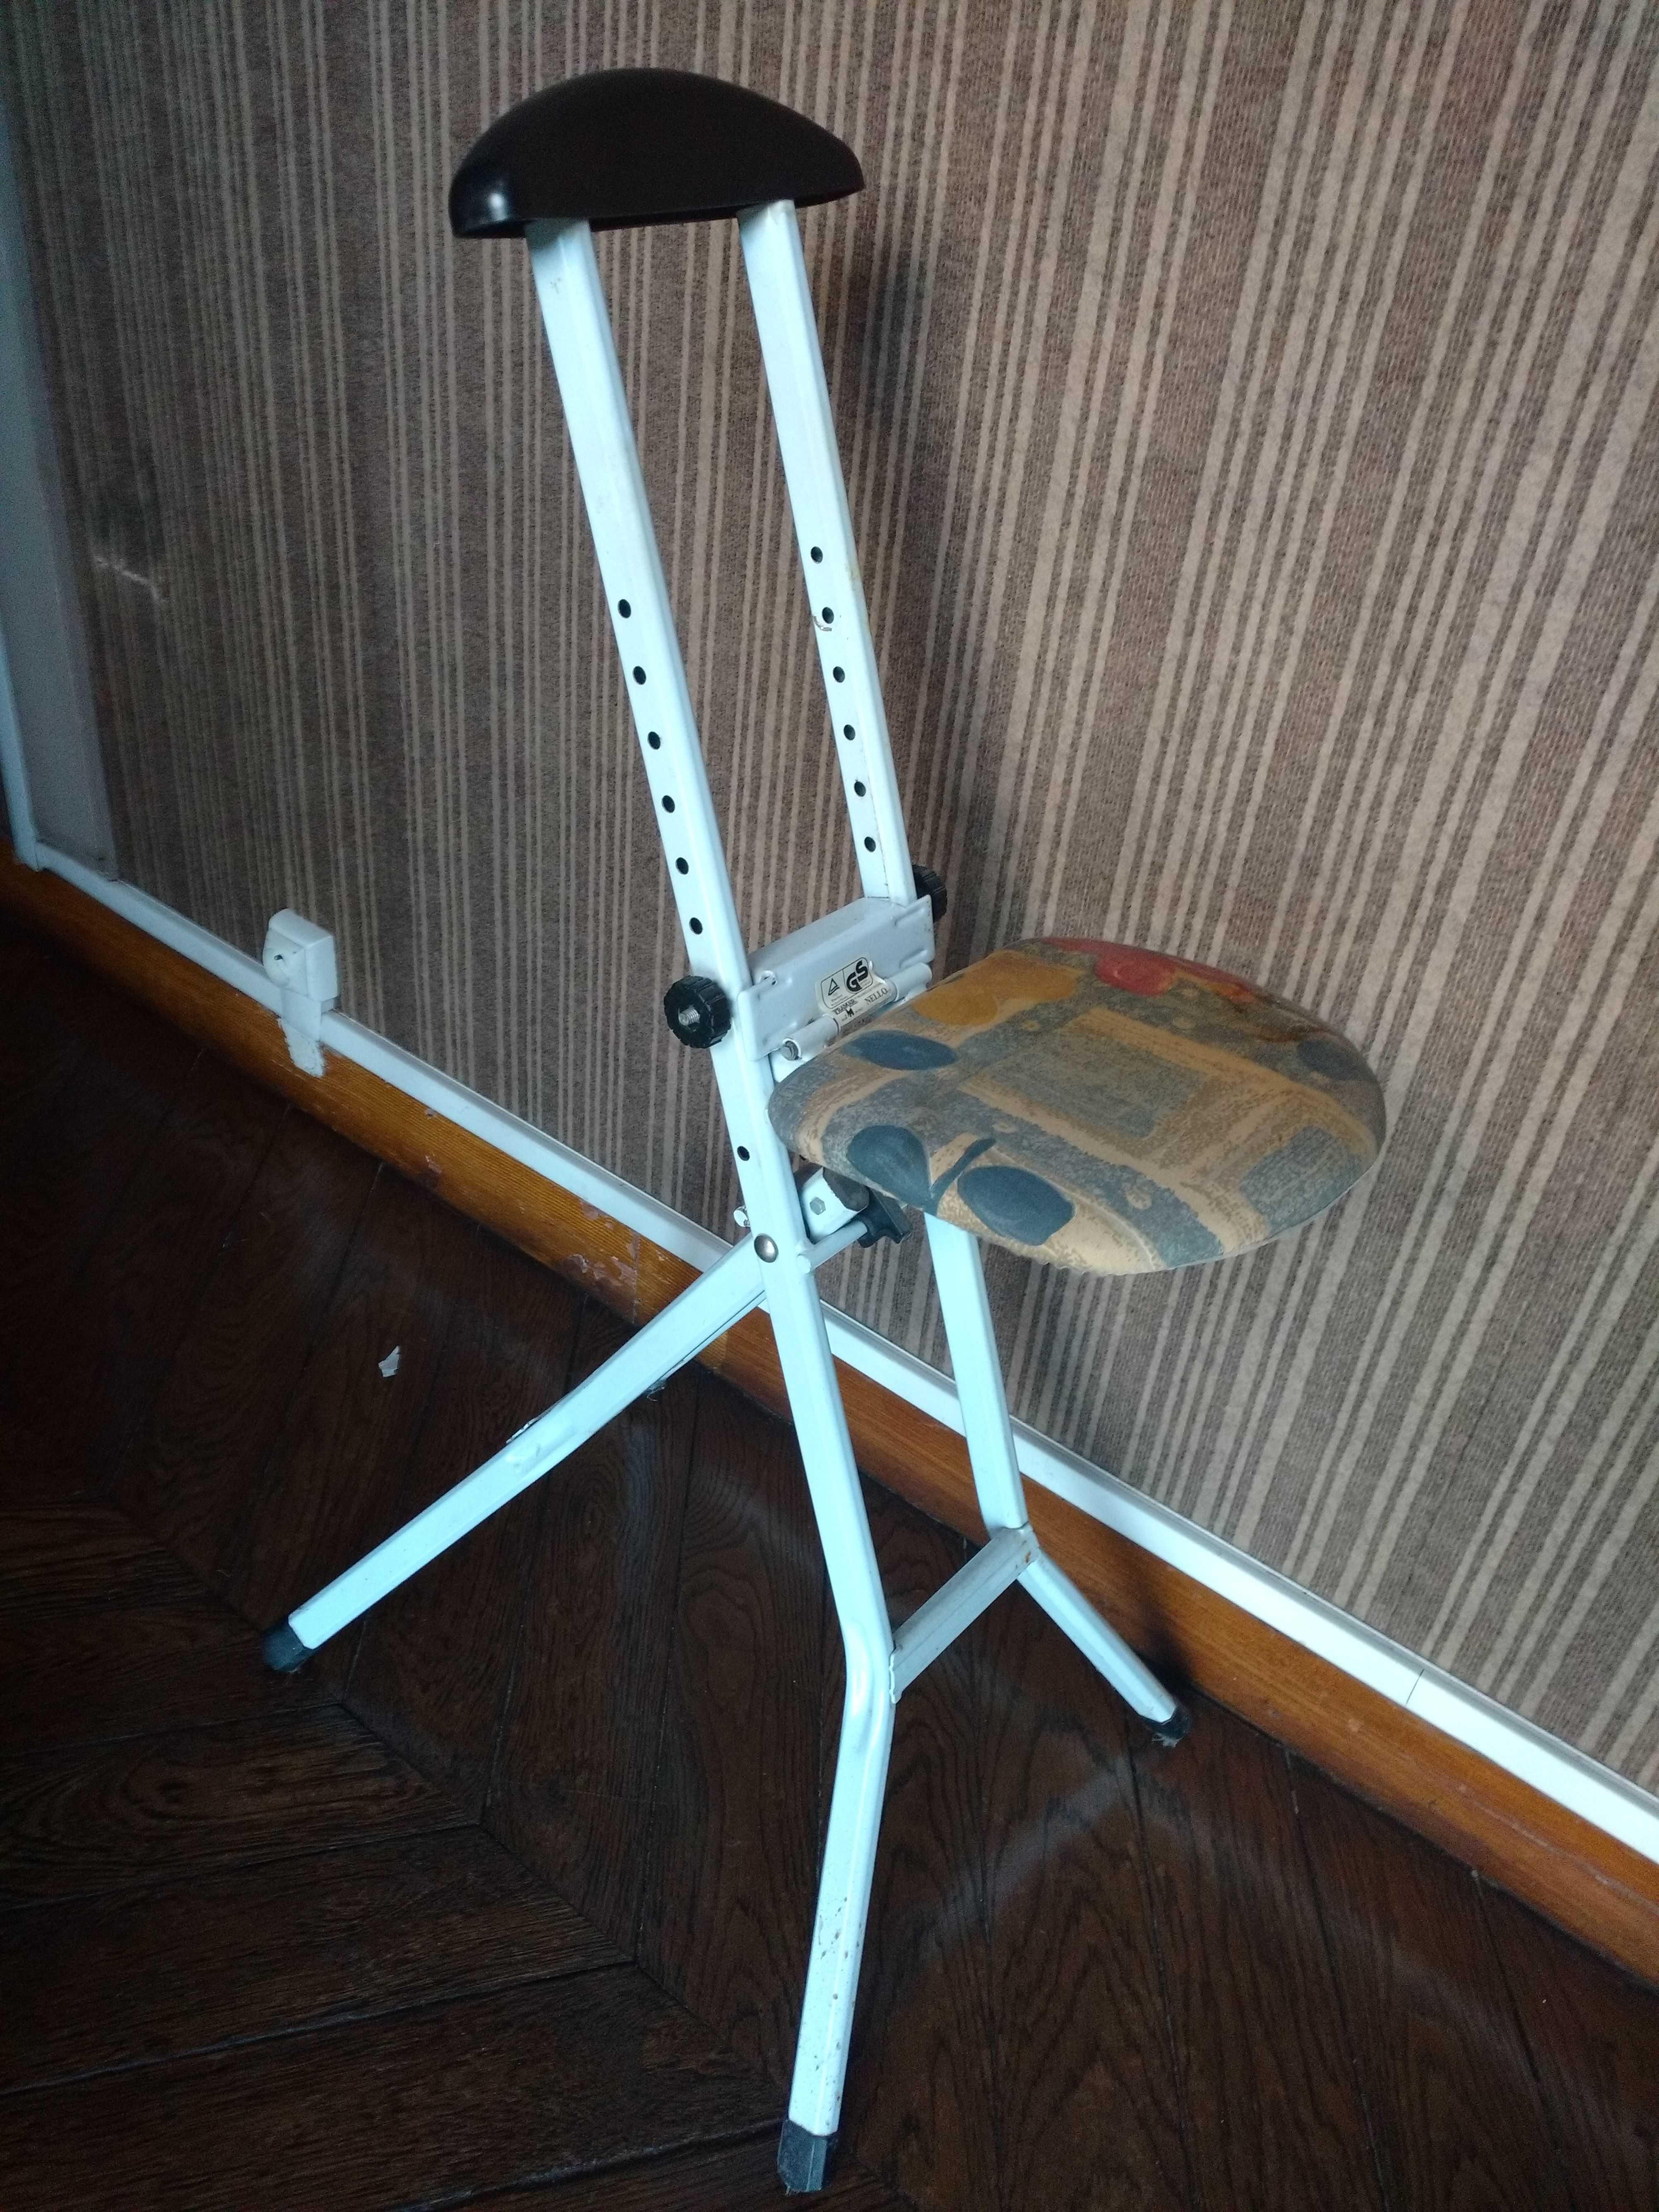 chaise pliable Framar 50 Paris 18 (75)